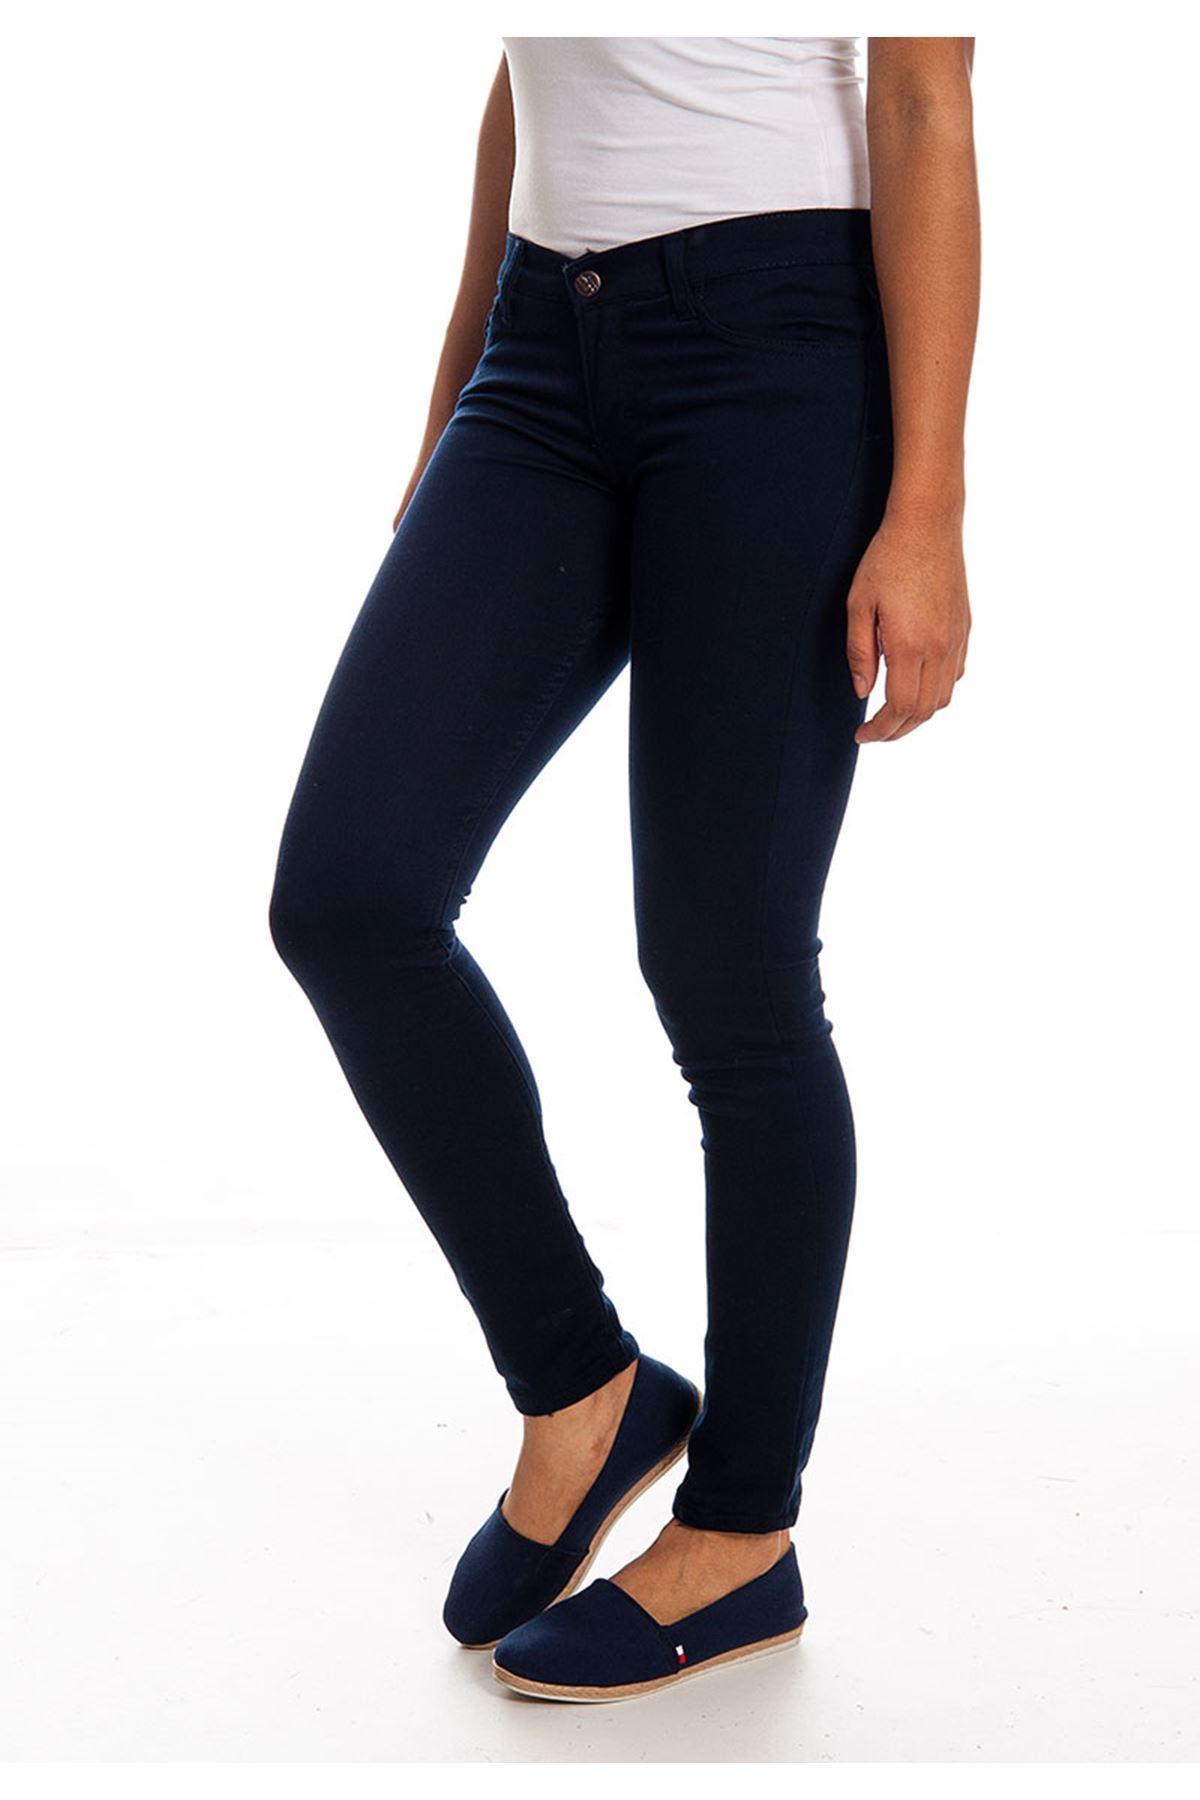 Lacivert Dar Paça Kadın Pantolon 4A-126045